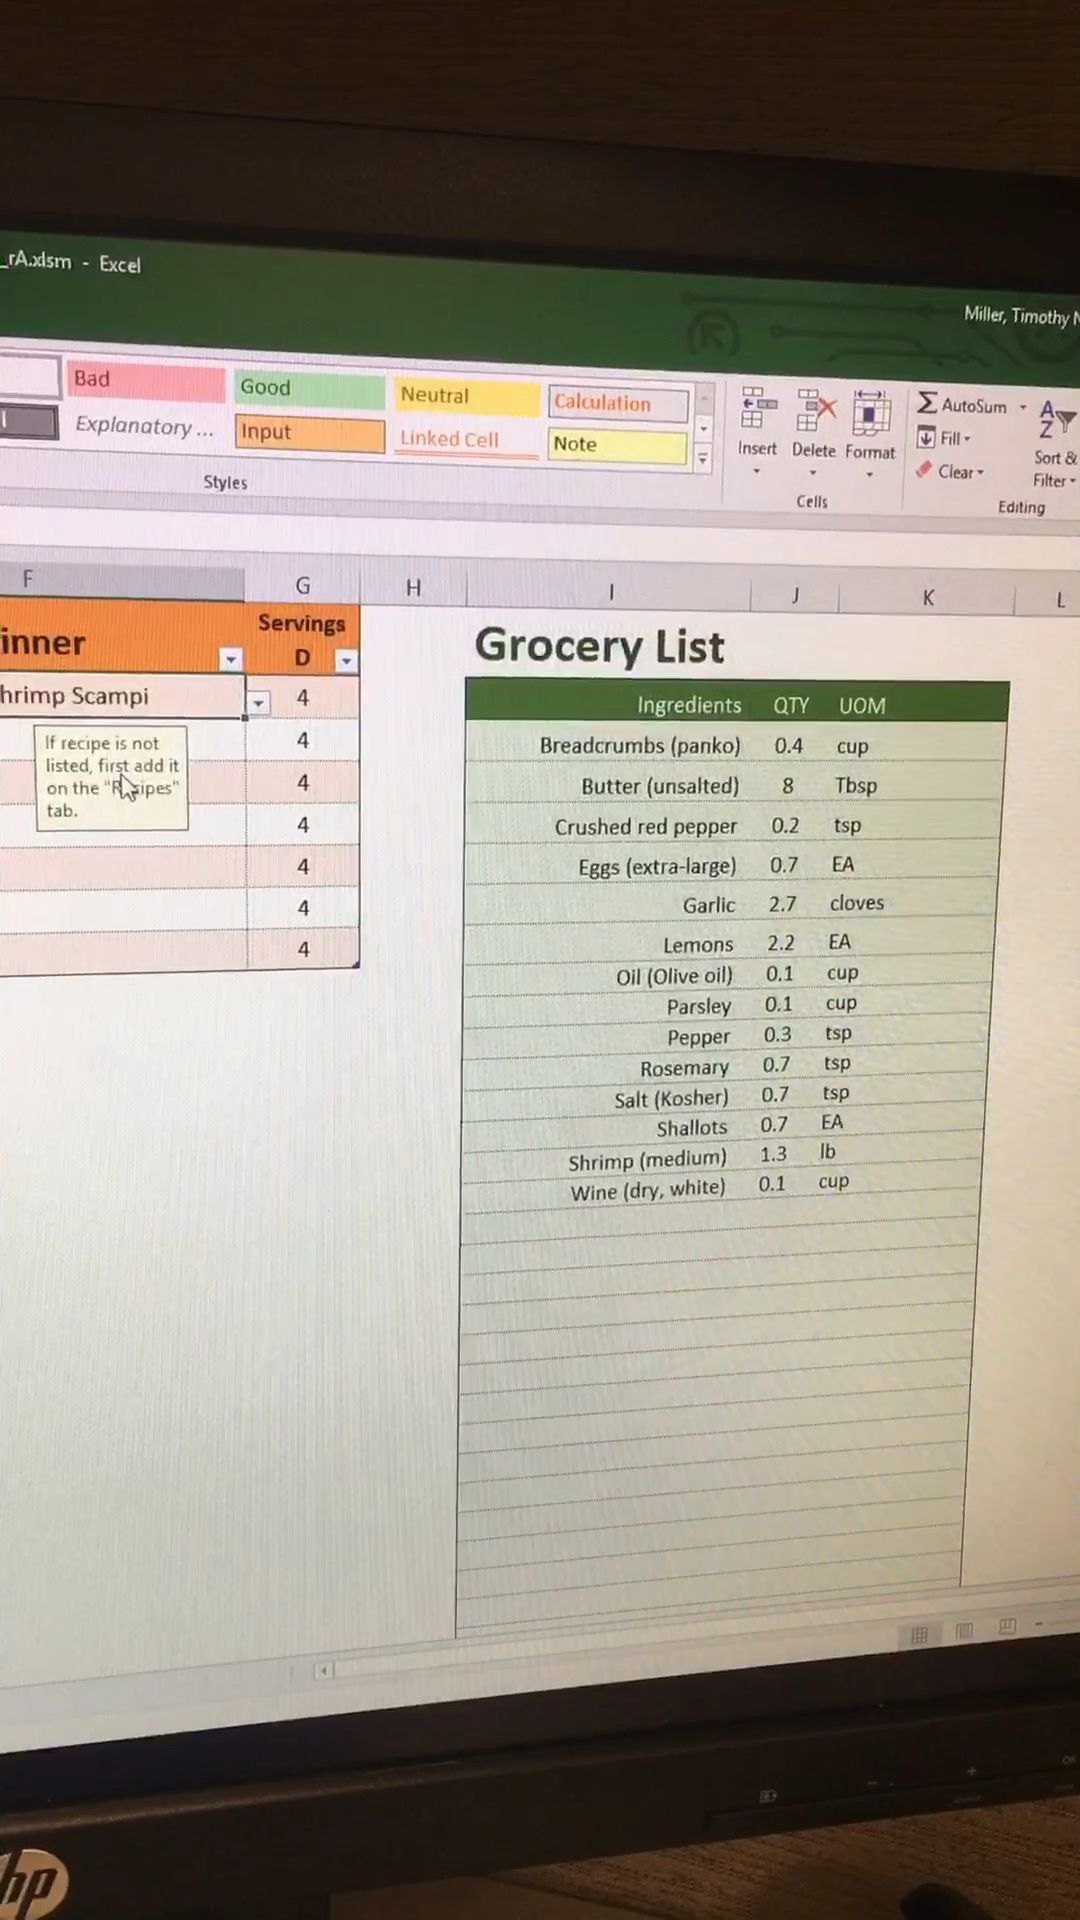 Grocery List Generator in Excel